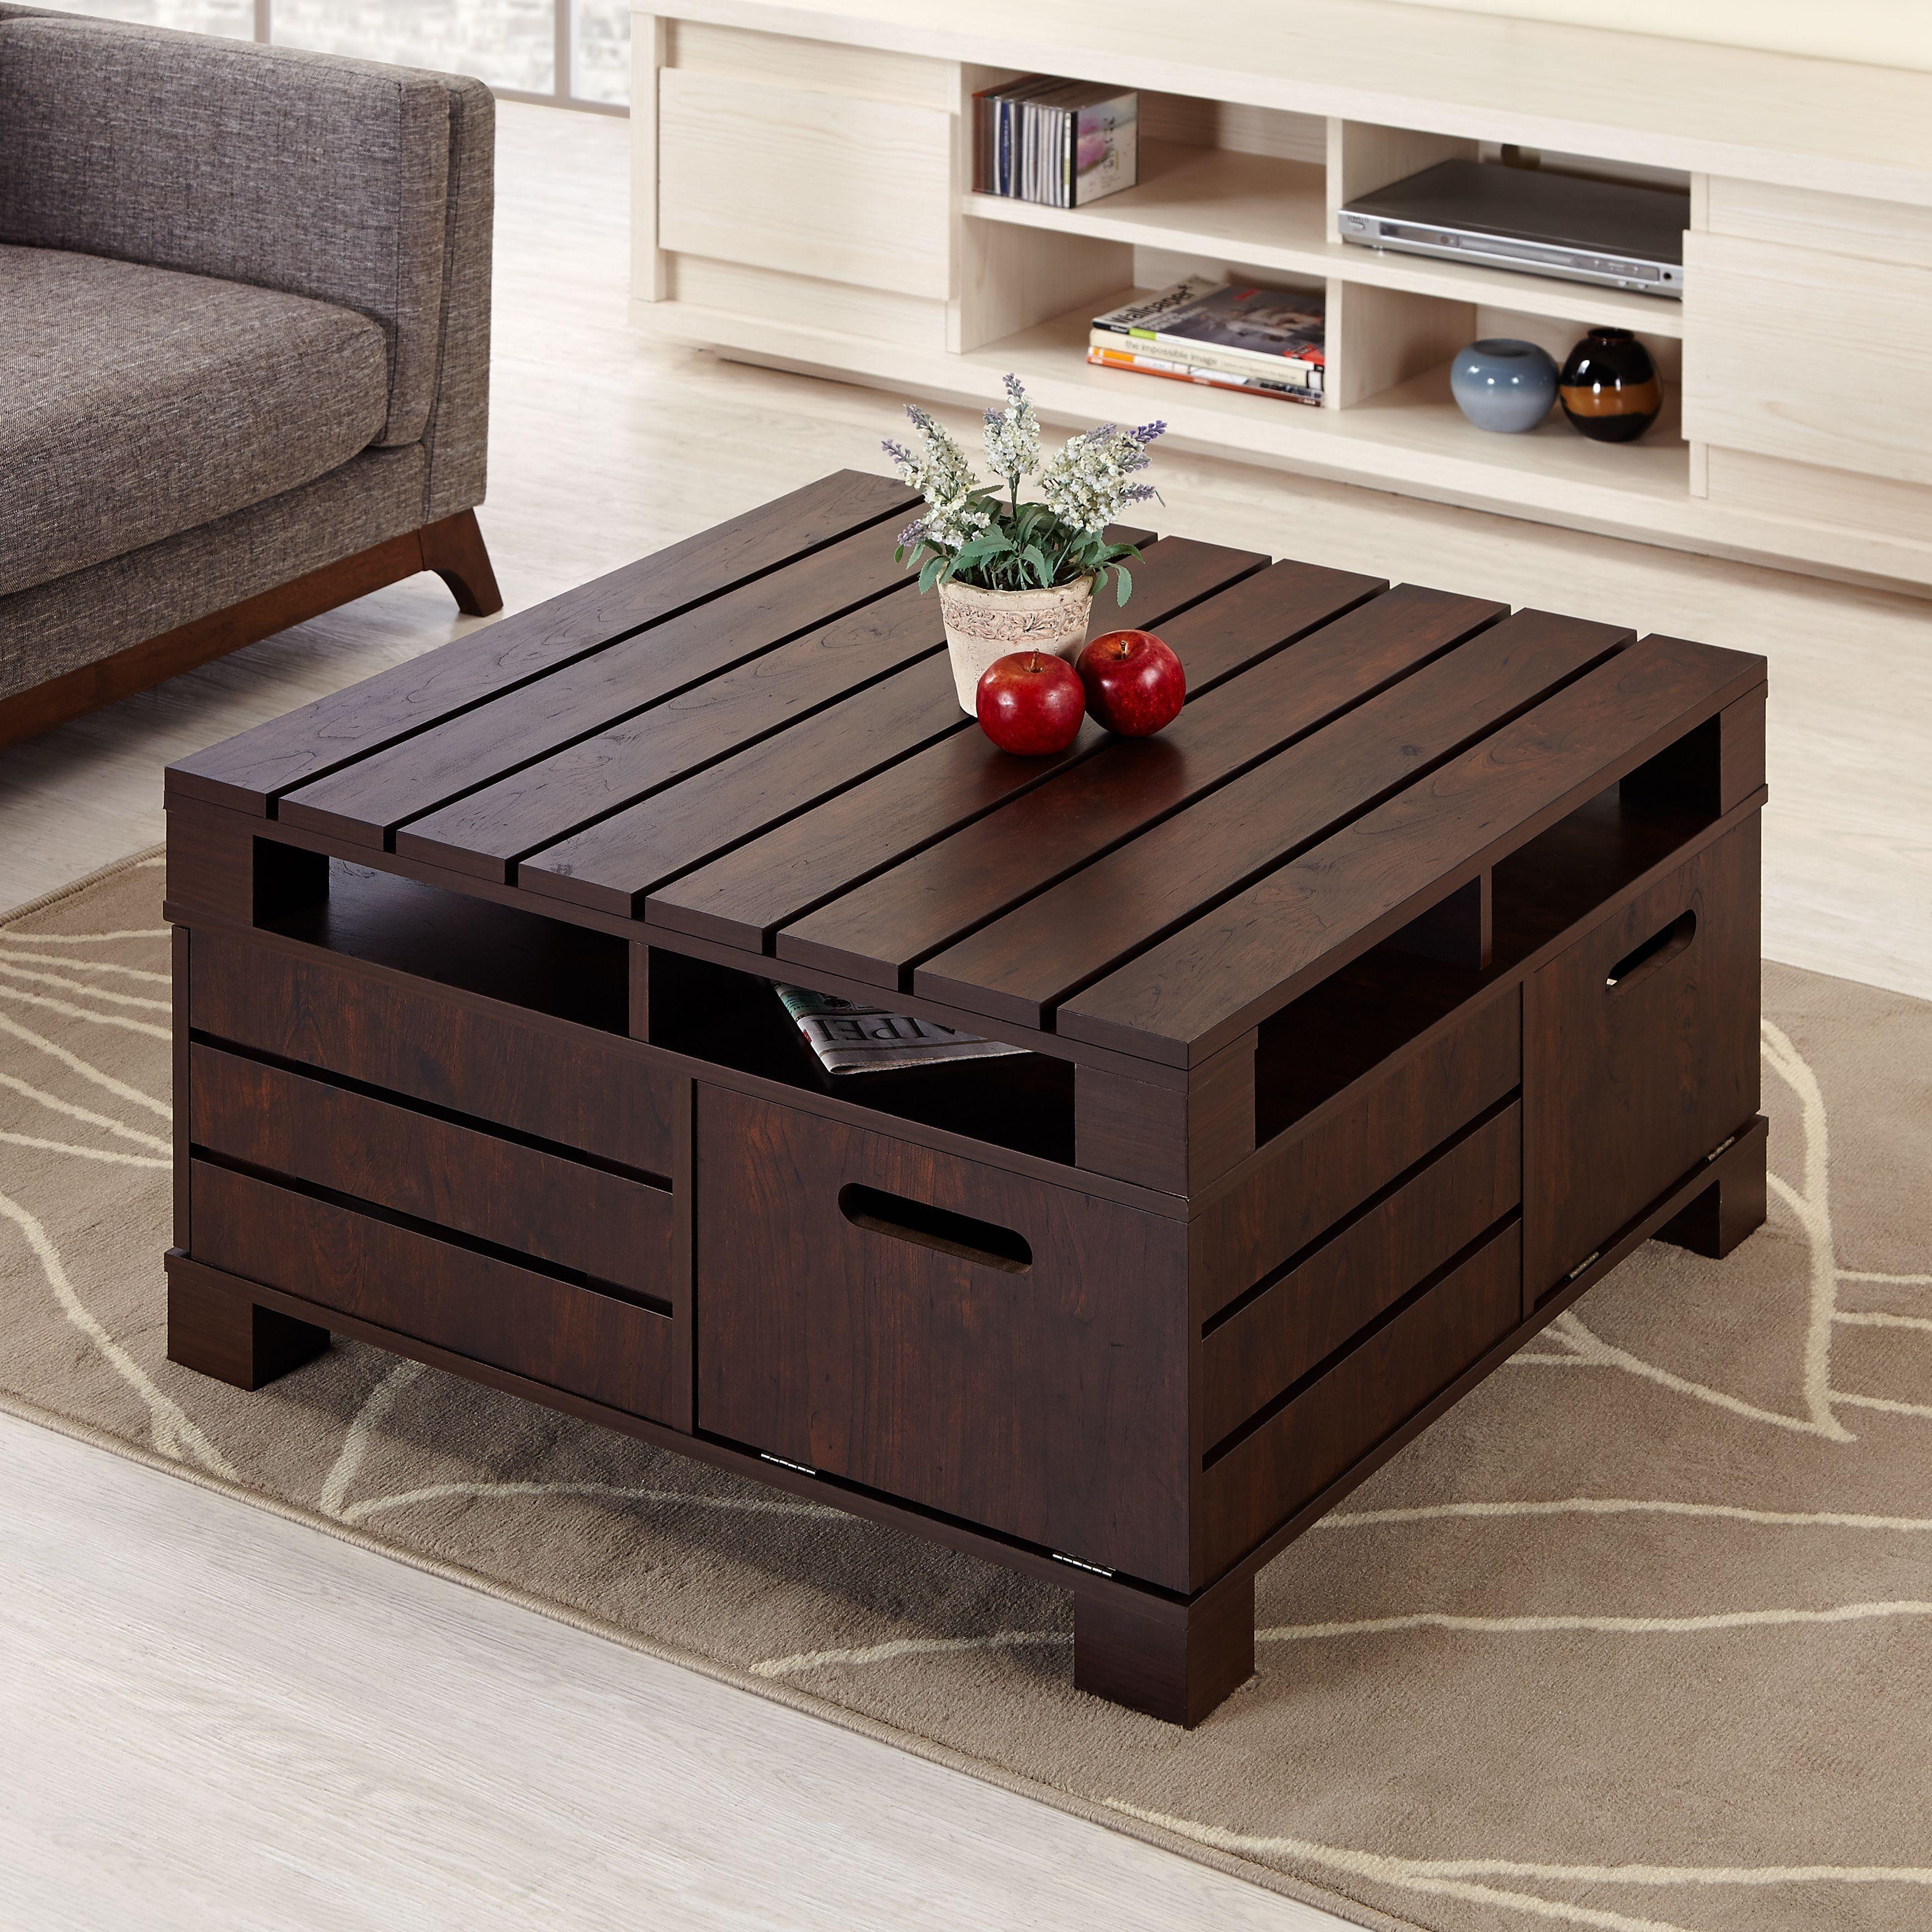 Fantastic Diy Projects Mini Pallet Coffee Table Design Ideas02